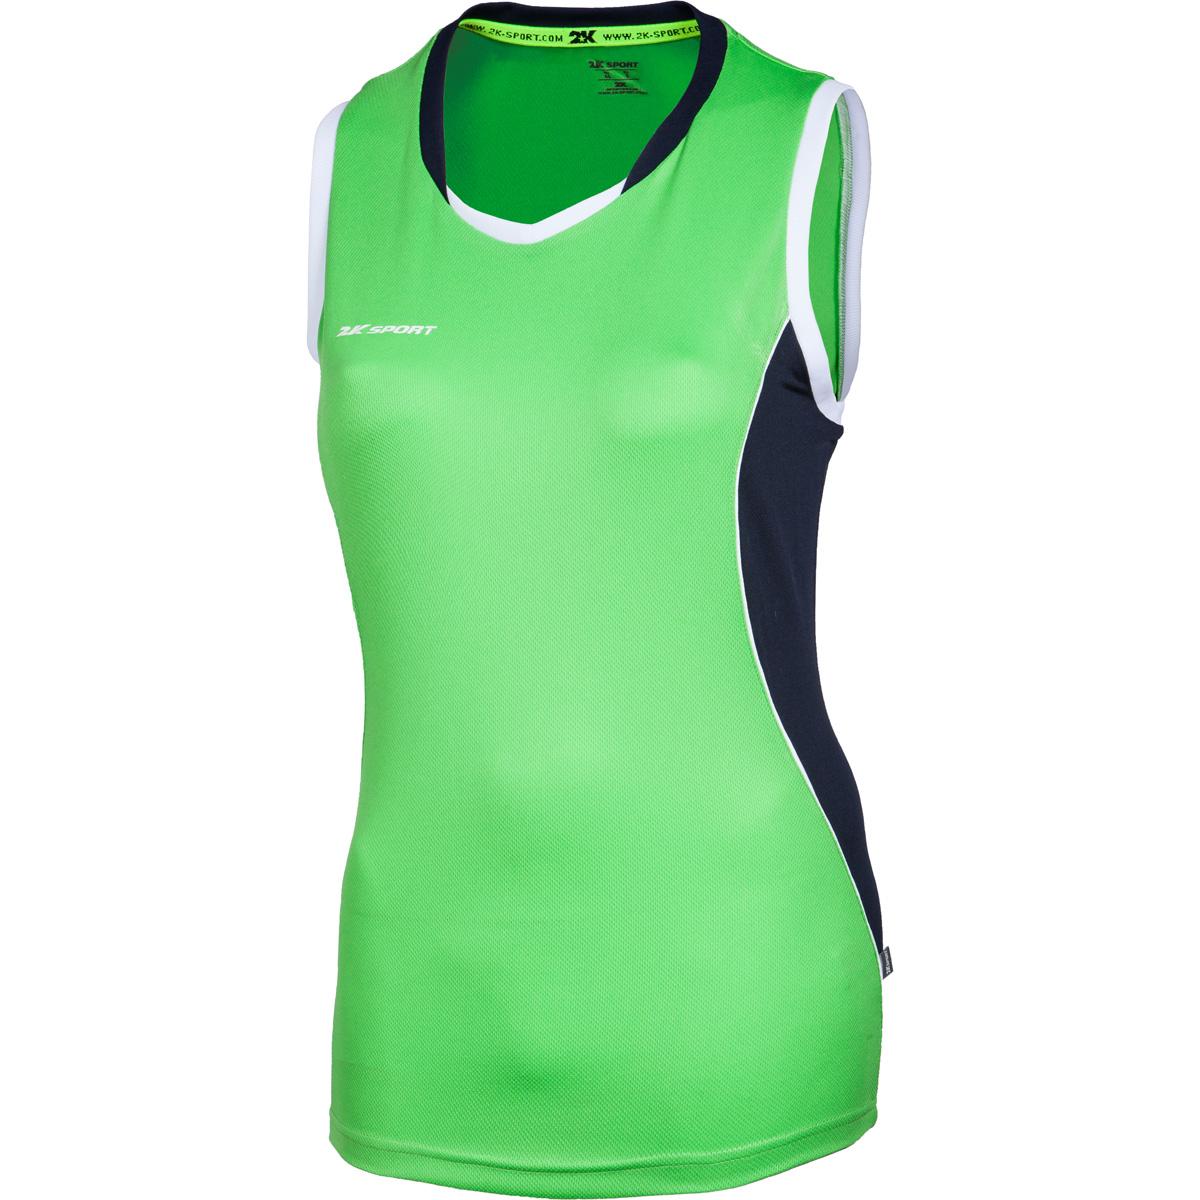 Майка баскетбольная женская 2K Sport Advance, цвет: светло-зеленый, темно-синий, белый. 130032. Размер S (42/44) - Баскетбол